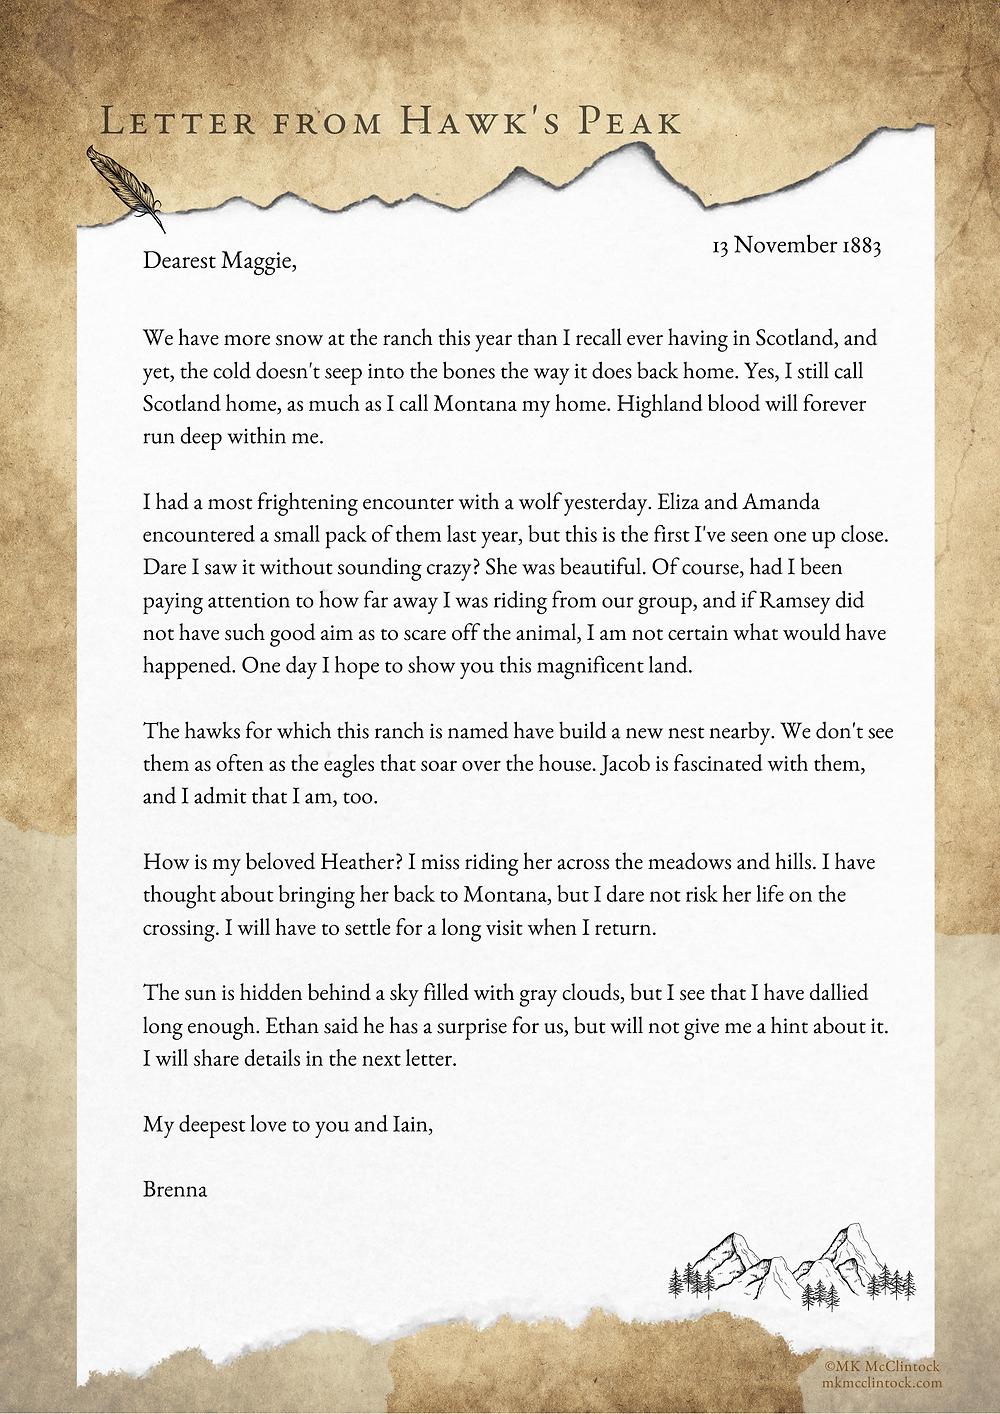 Letter From Hawk's Peak - November 13, 1883_MK McClintock_Montana Gallagher series